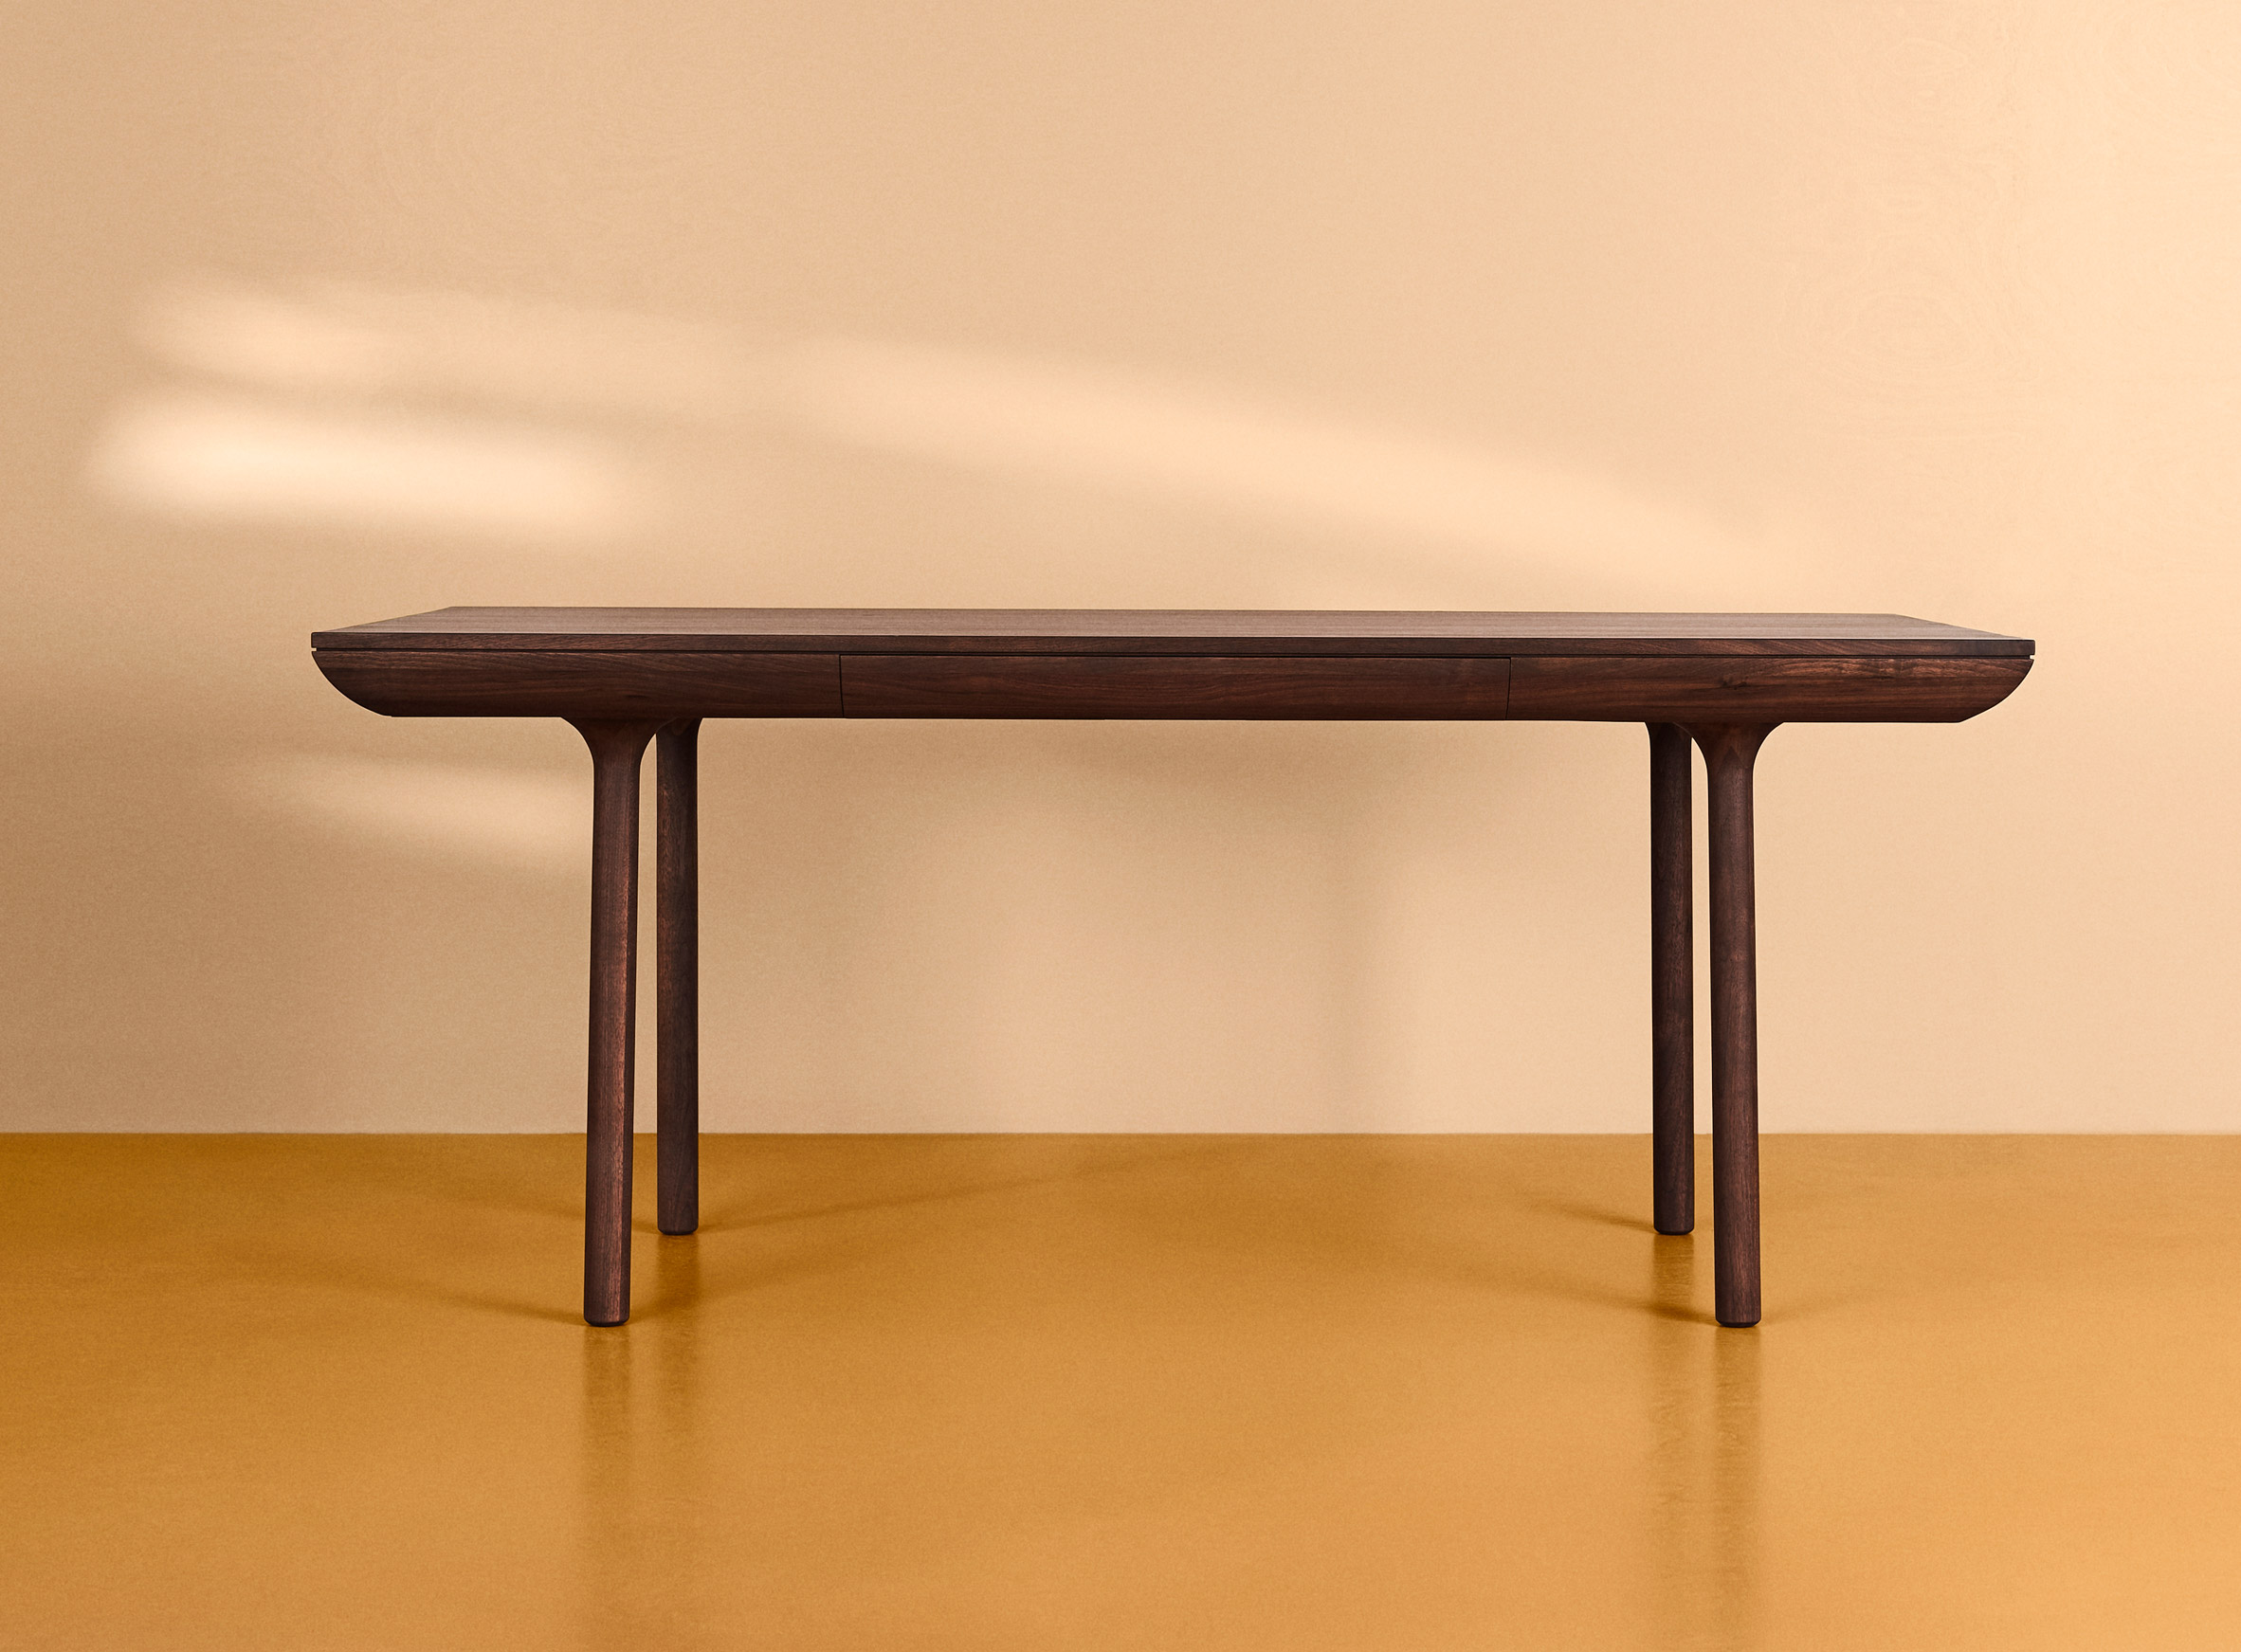 runa-isabel-ahm-aarm-nordic-design-furniture-danish_dezeen_2364_col_0.jpg